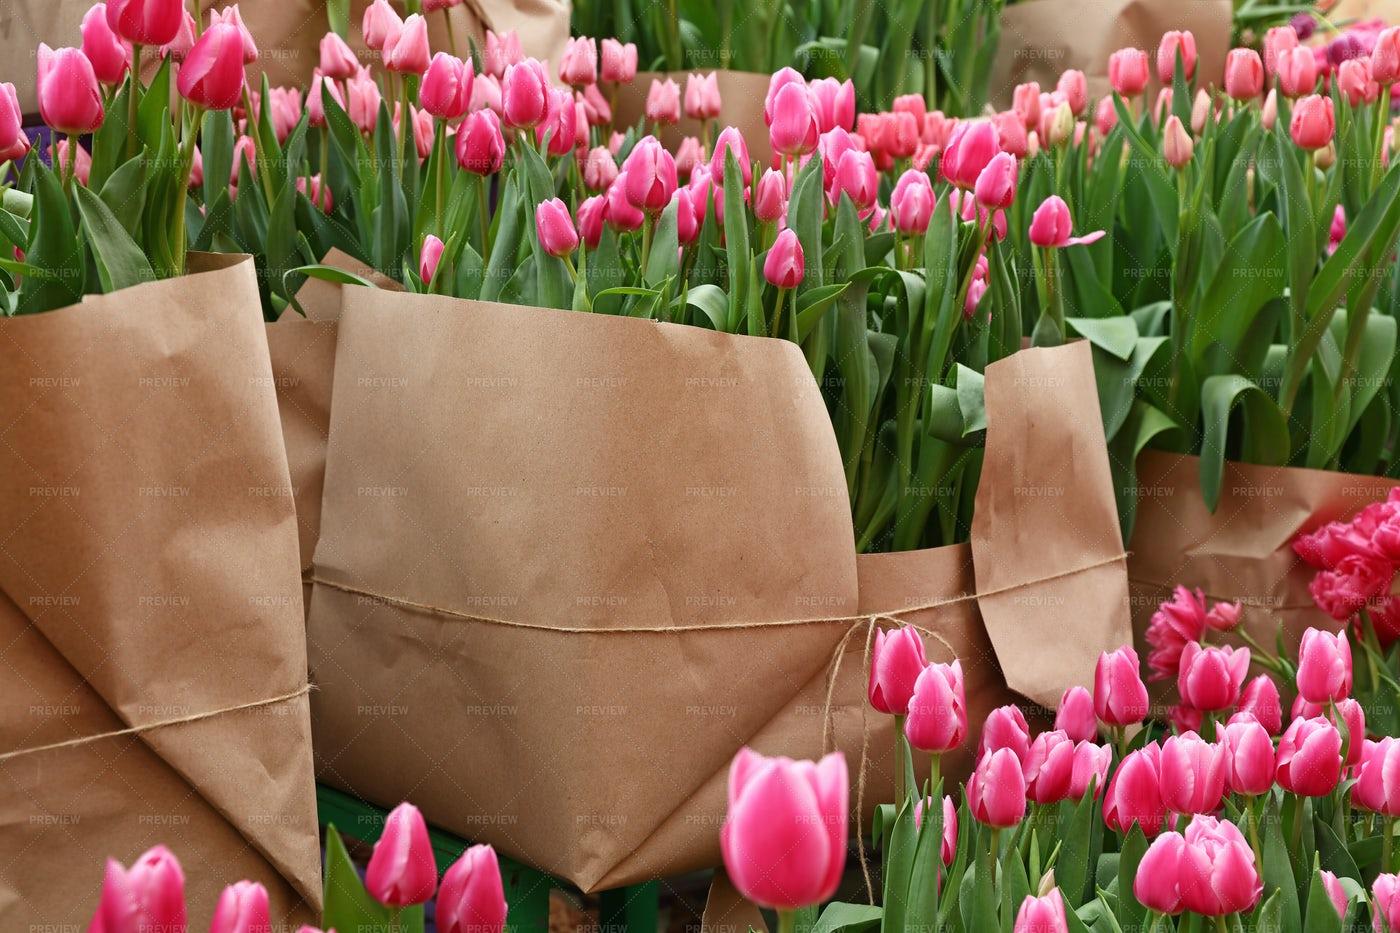 Tulip Flowers For Sale: Stock Photos